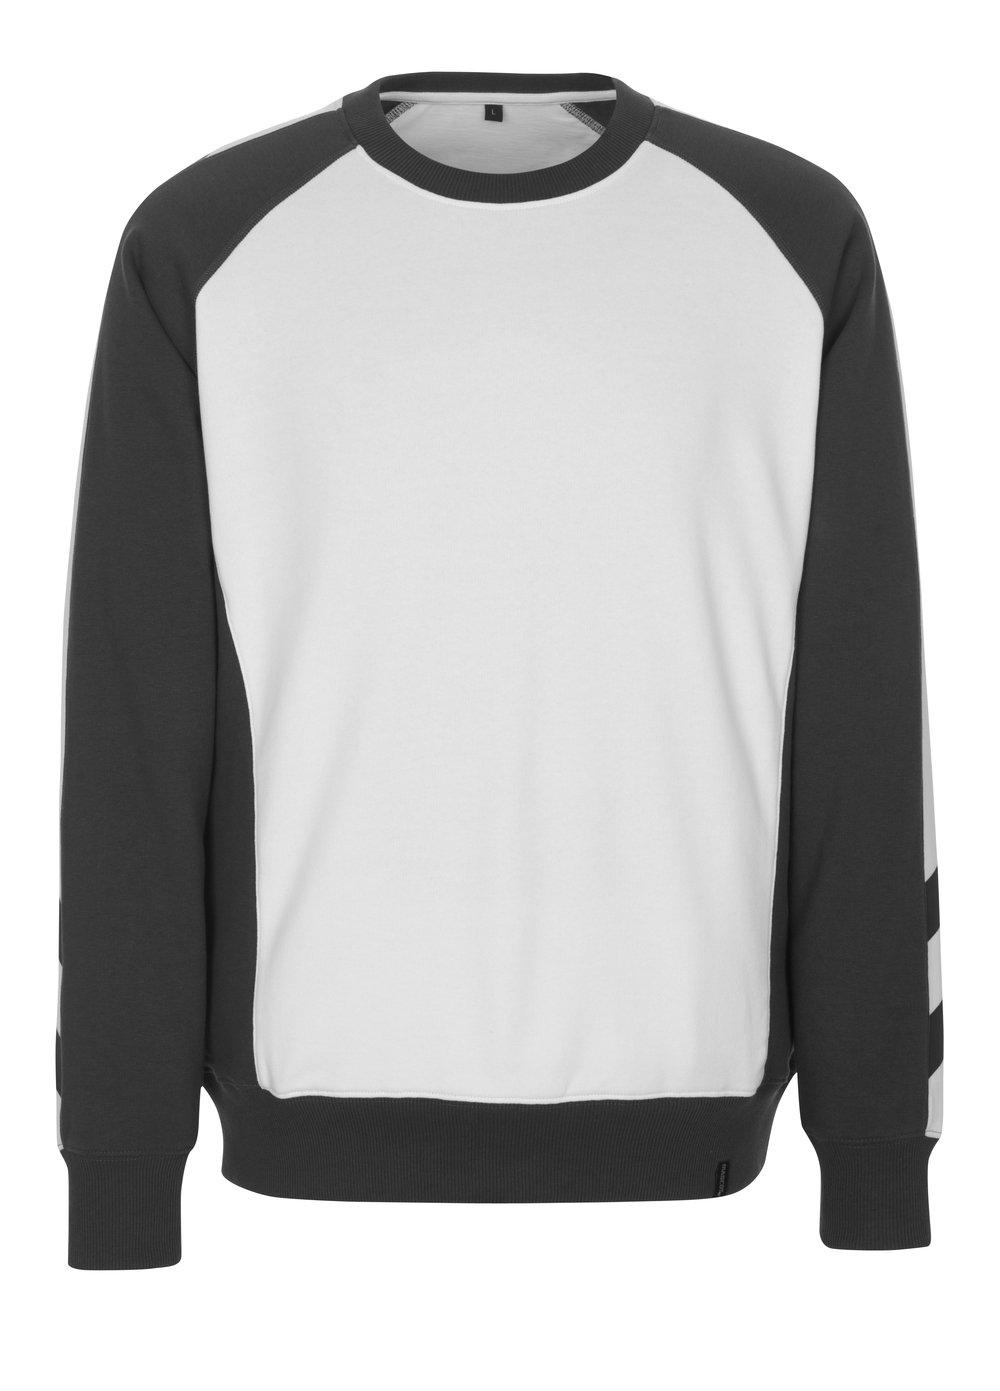 Mascot 50503-830-0618-L Sweatshirt Witten, weiß dunkelanthrazit, L